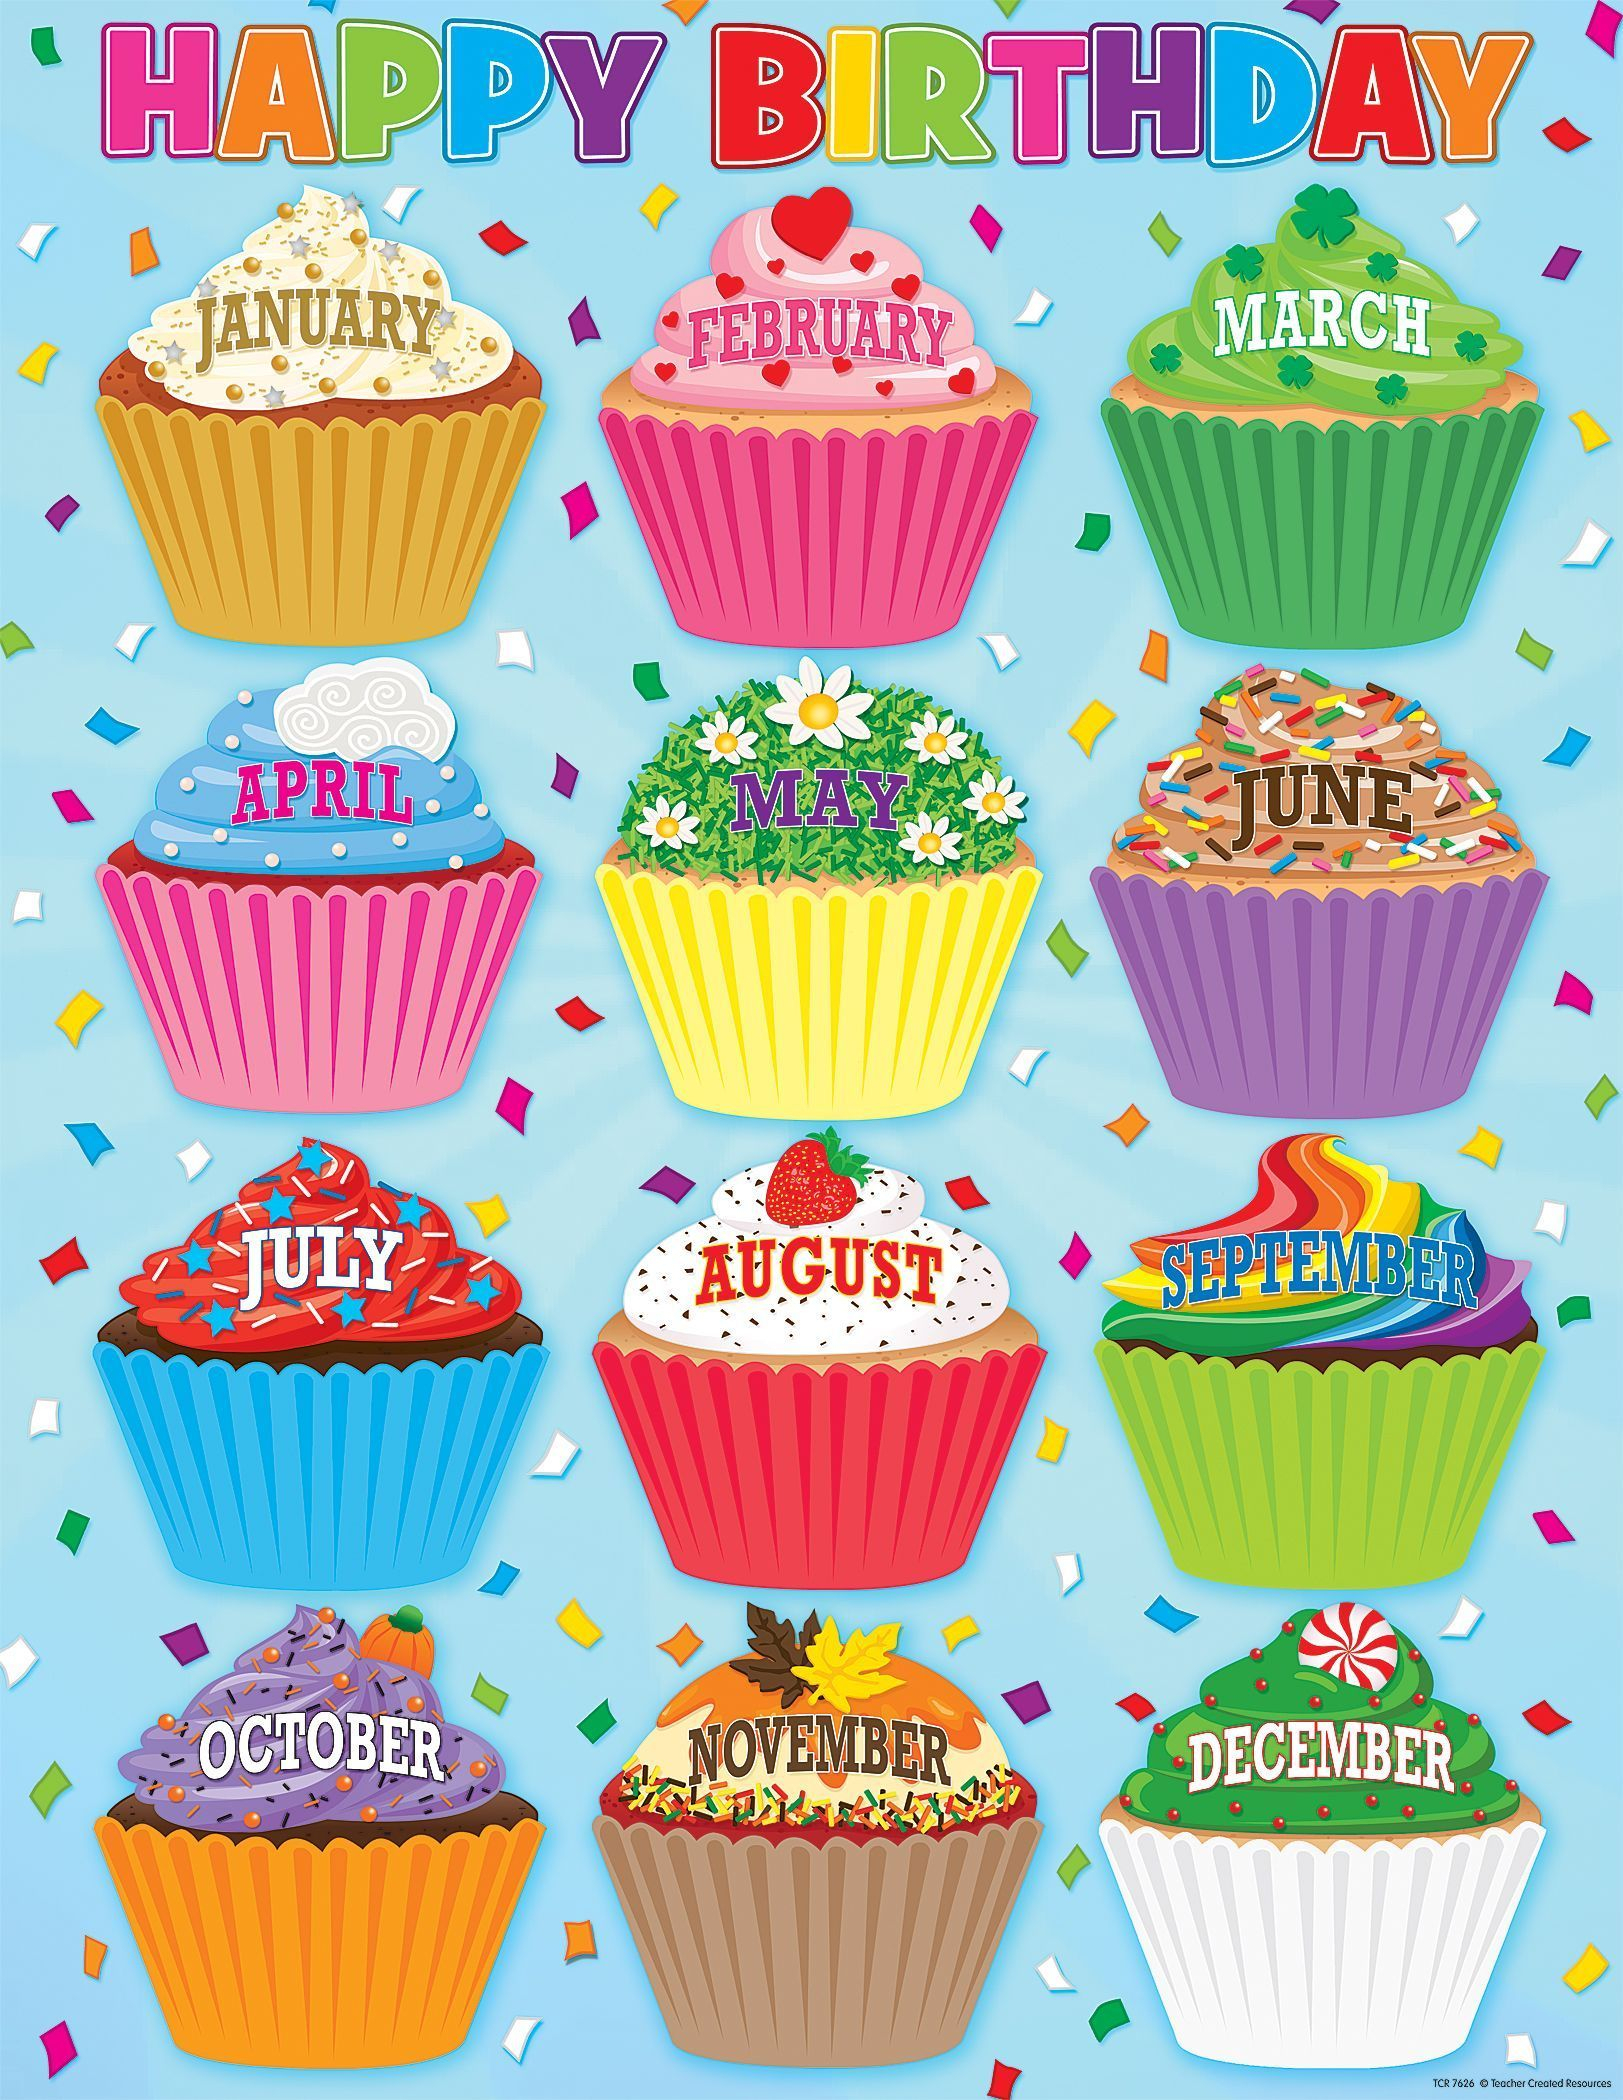 Cupcakes Happy Birthday Chart | Birthday Charts, Classroom for Birthday Display Cupcakes